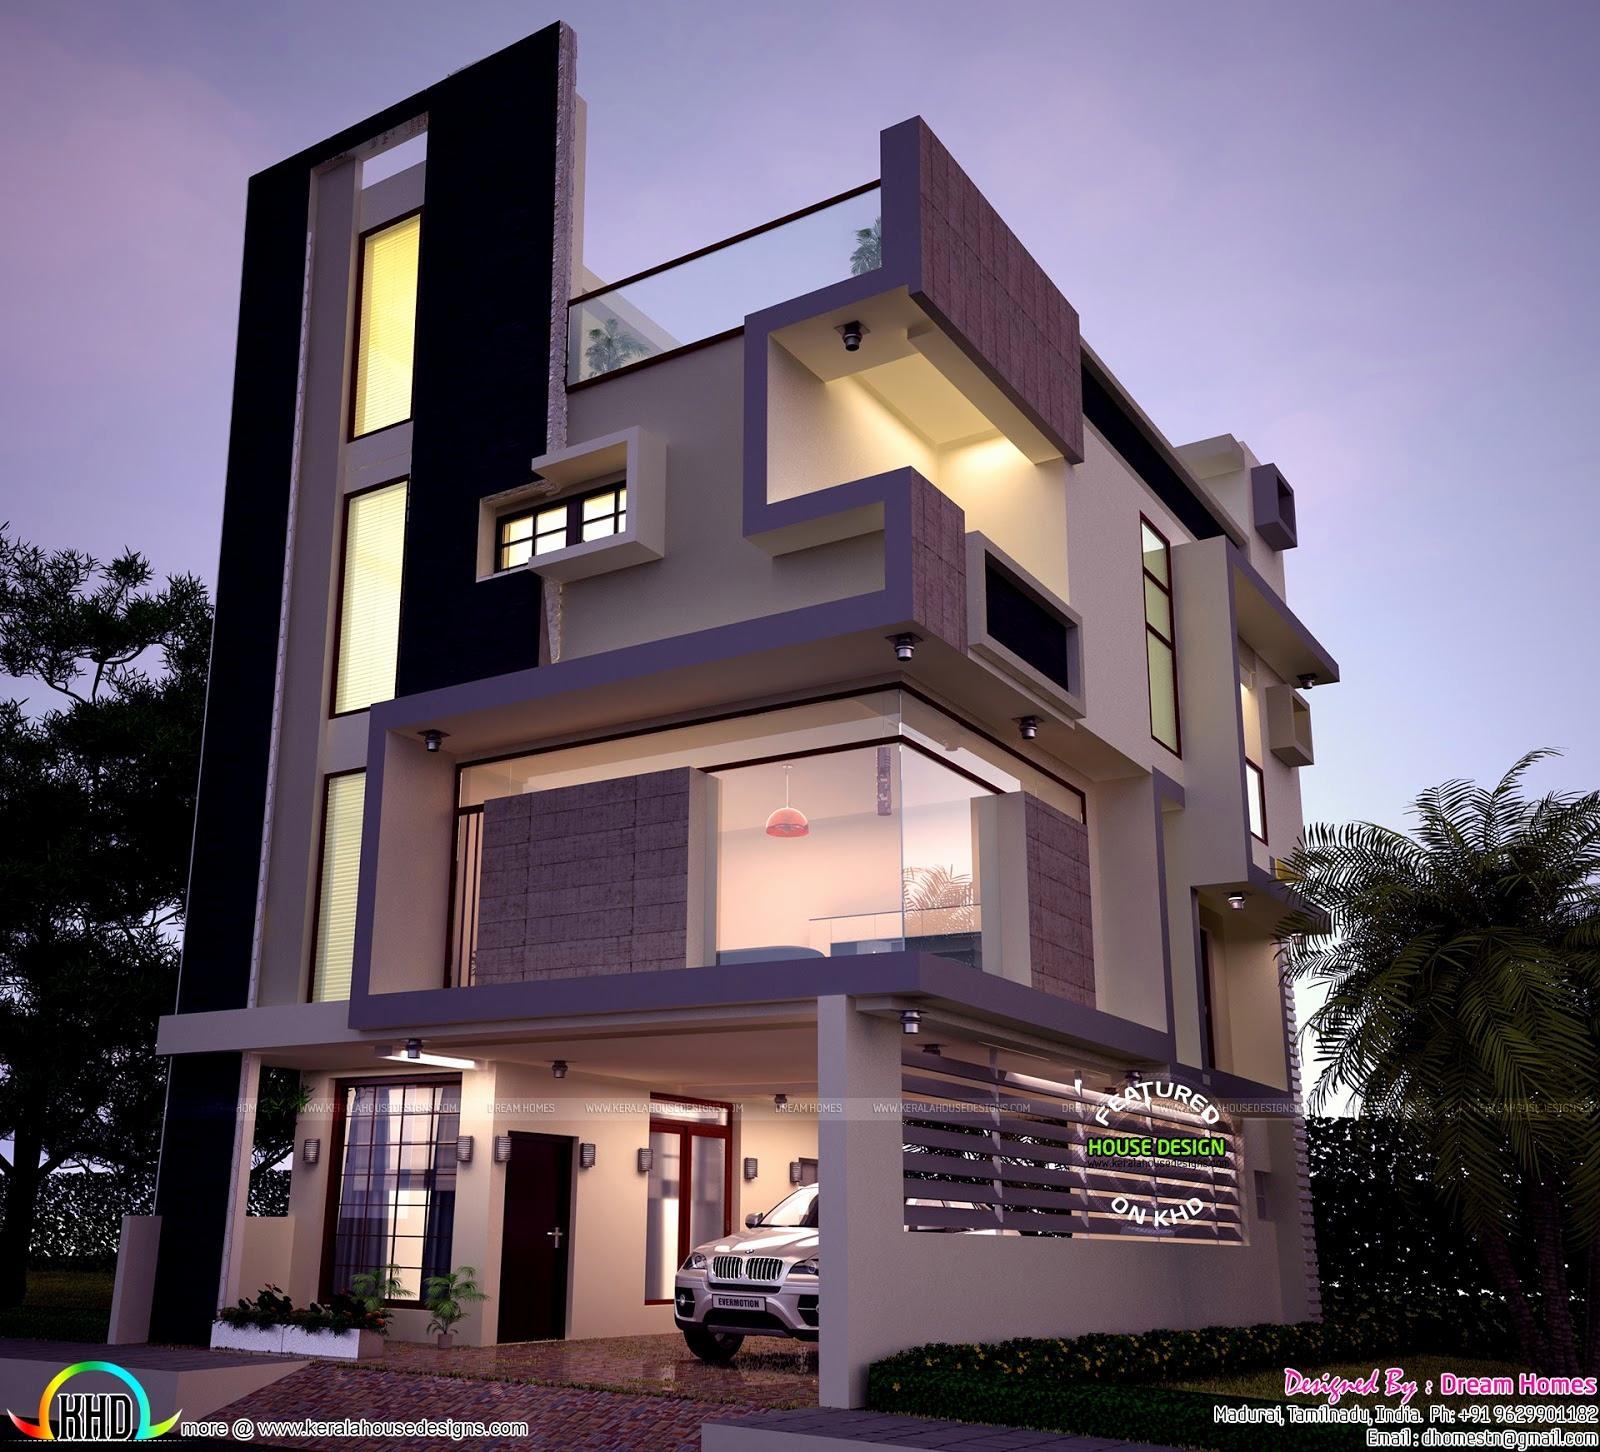 JBSOLIS House